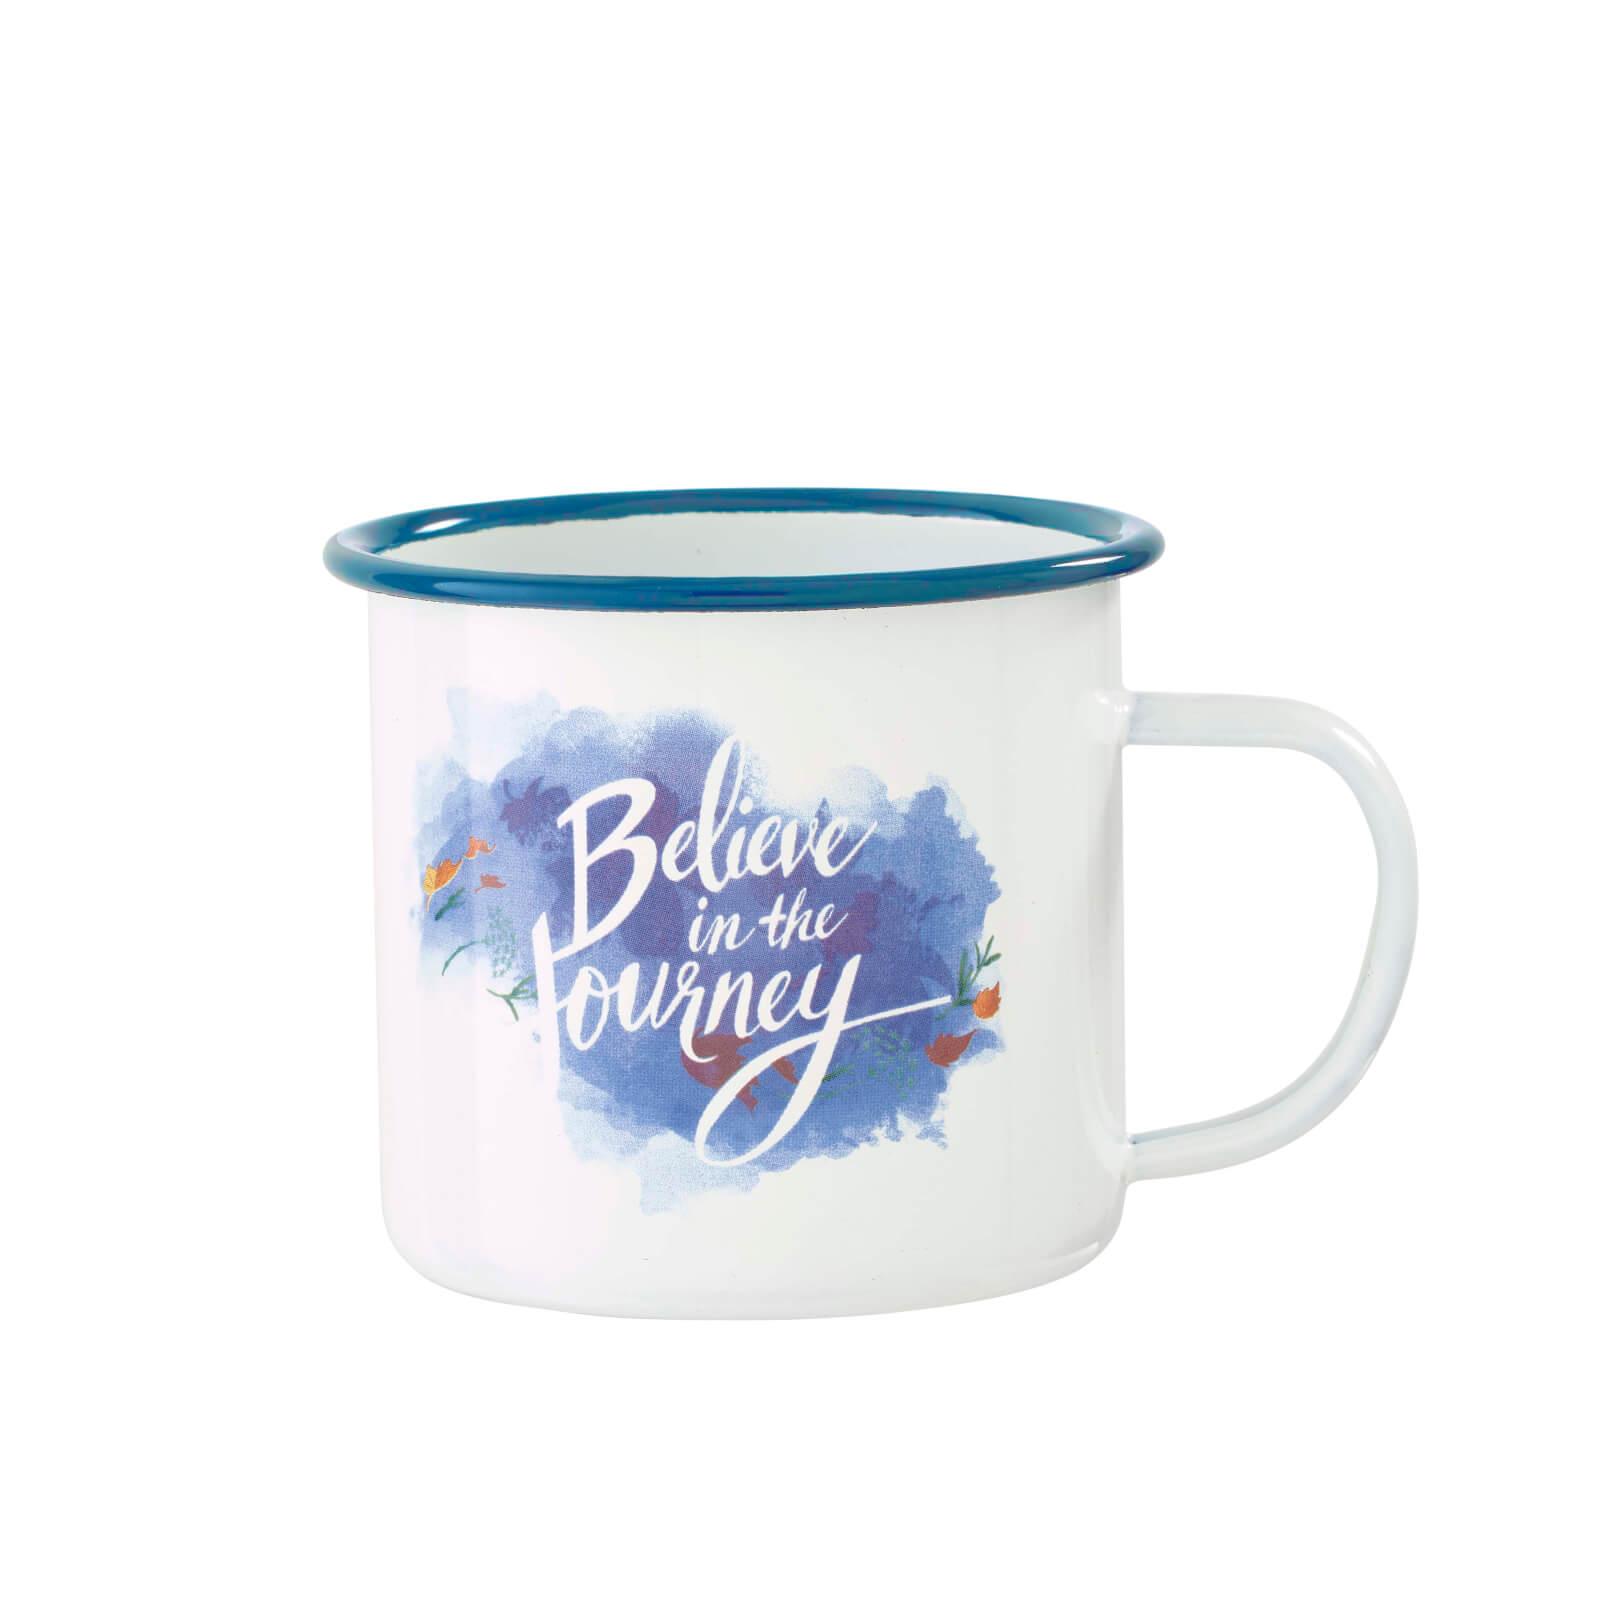 Image of Funko Homeware Disney Frozen 2 Believe in the Journey Mug